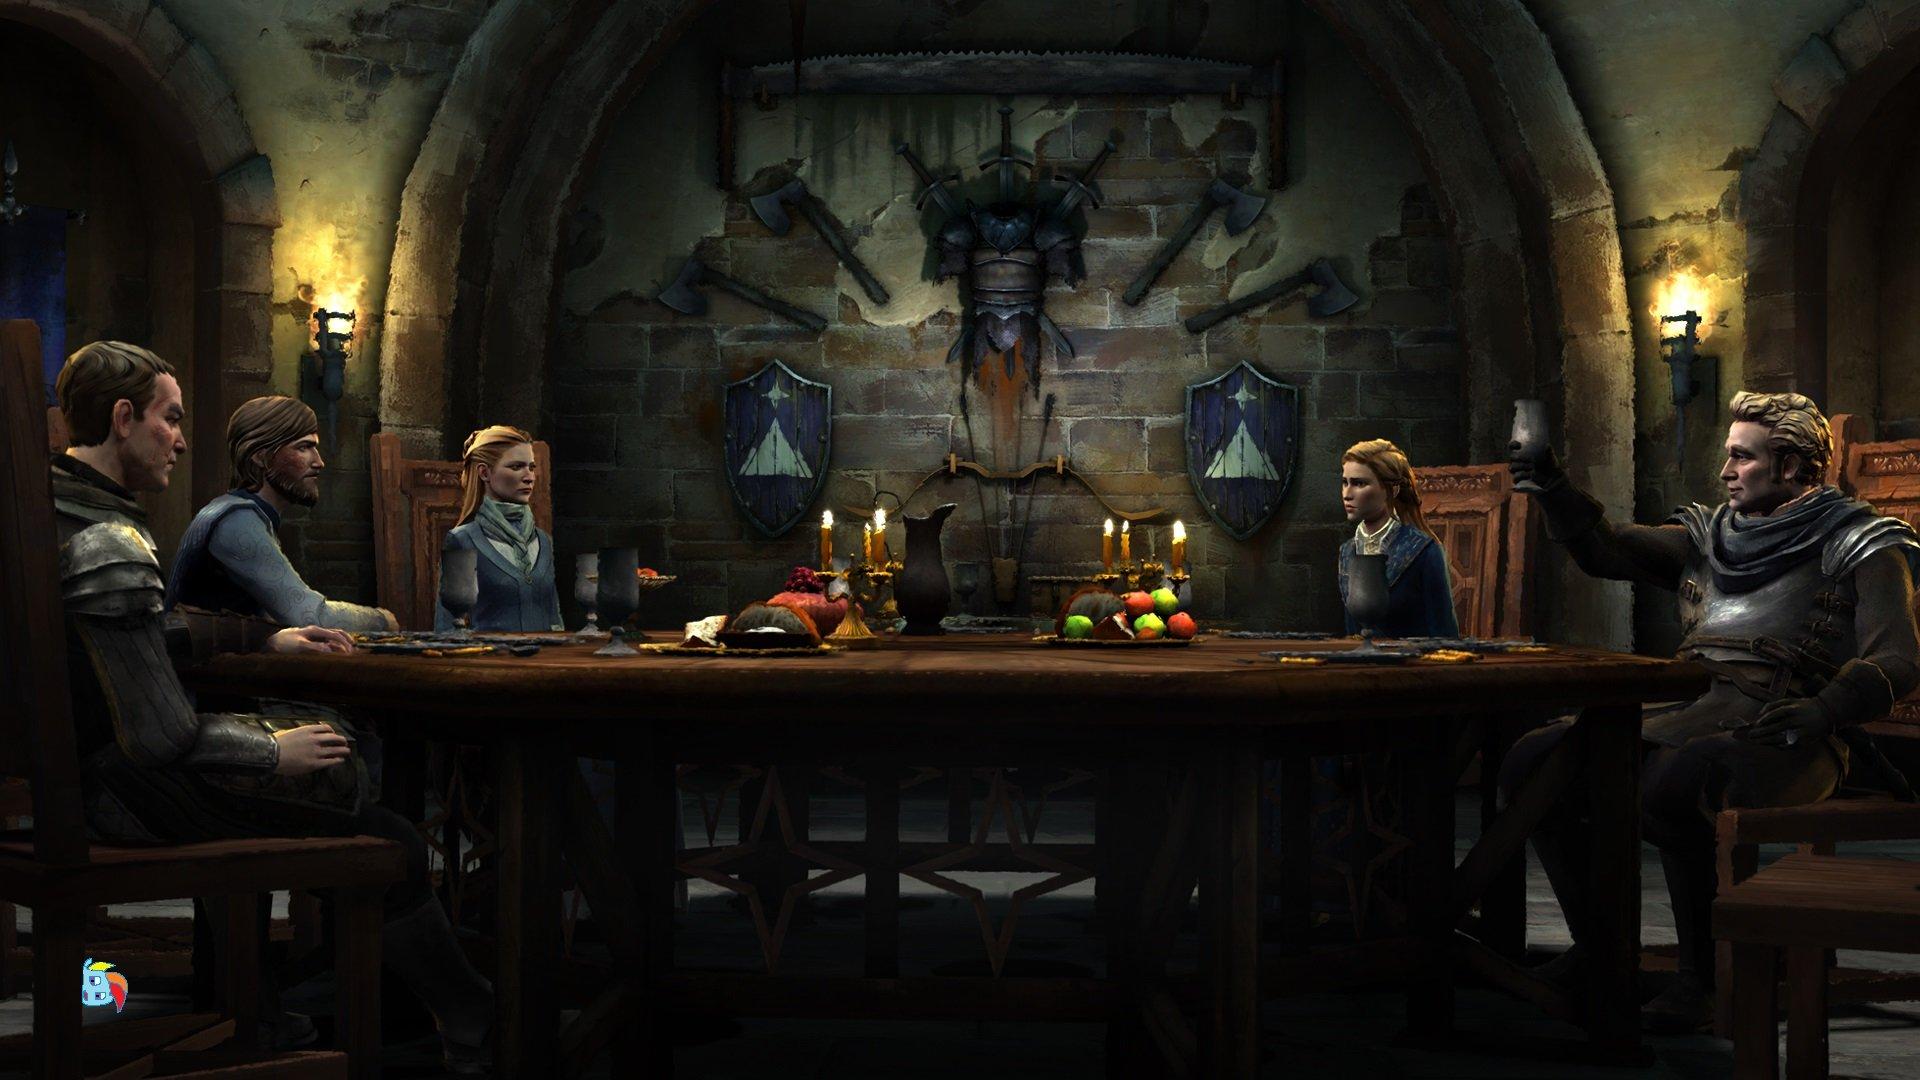 Game of Thrones - Episode 4 'Sons of Winter' Screens. - Изображение 3